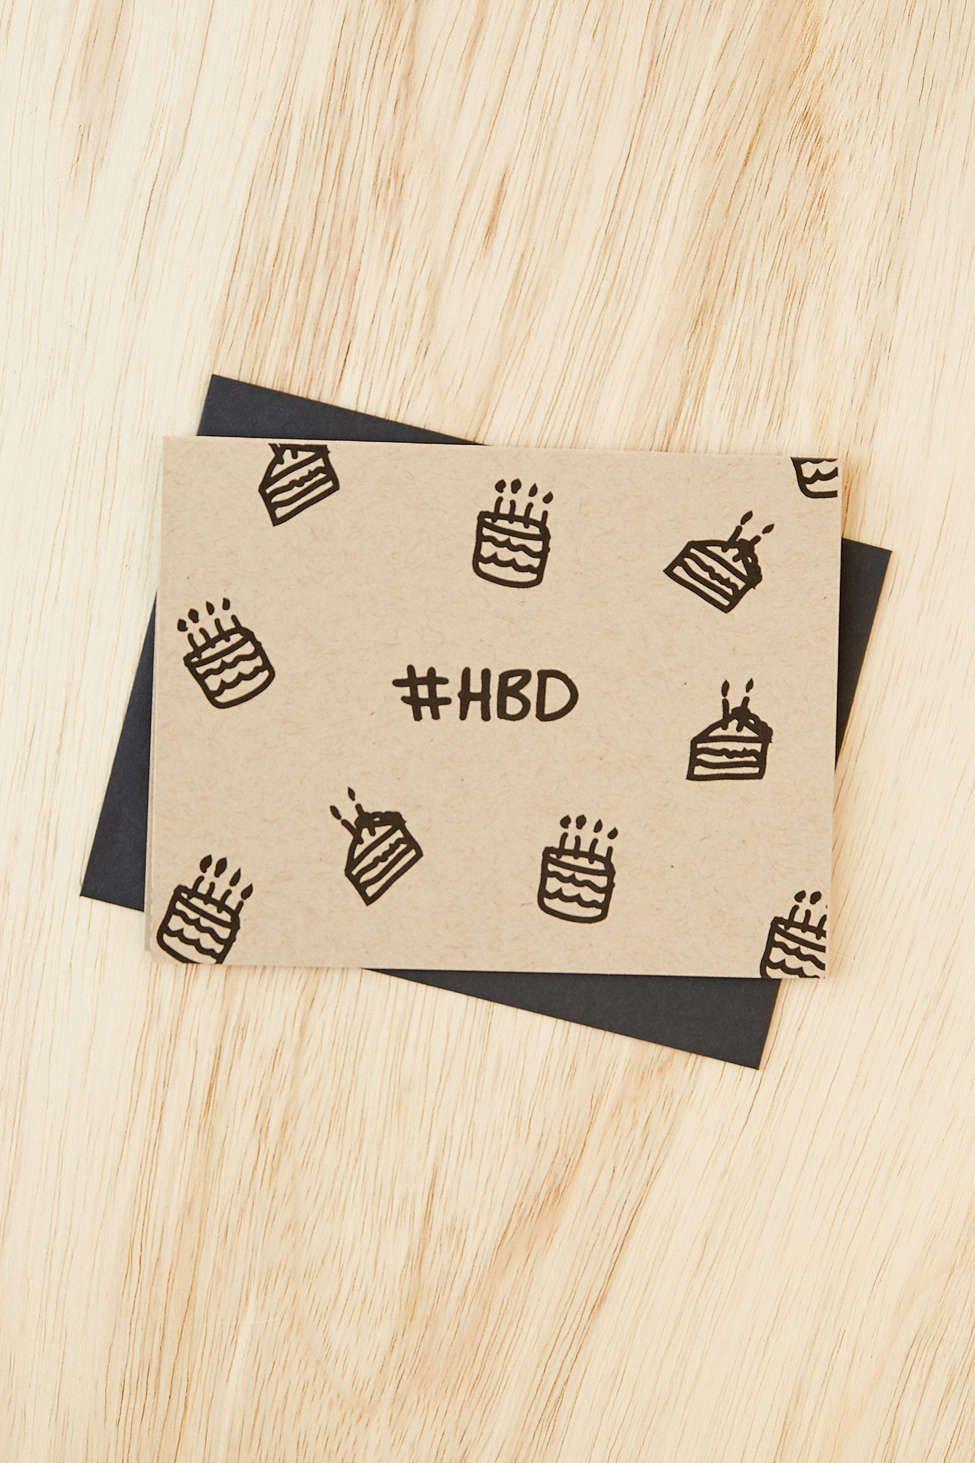 daydream prints hbd card  greeting card shops happy